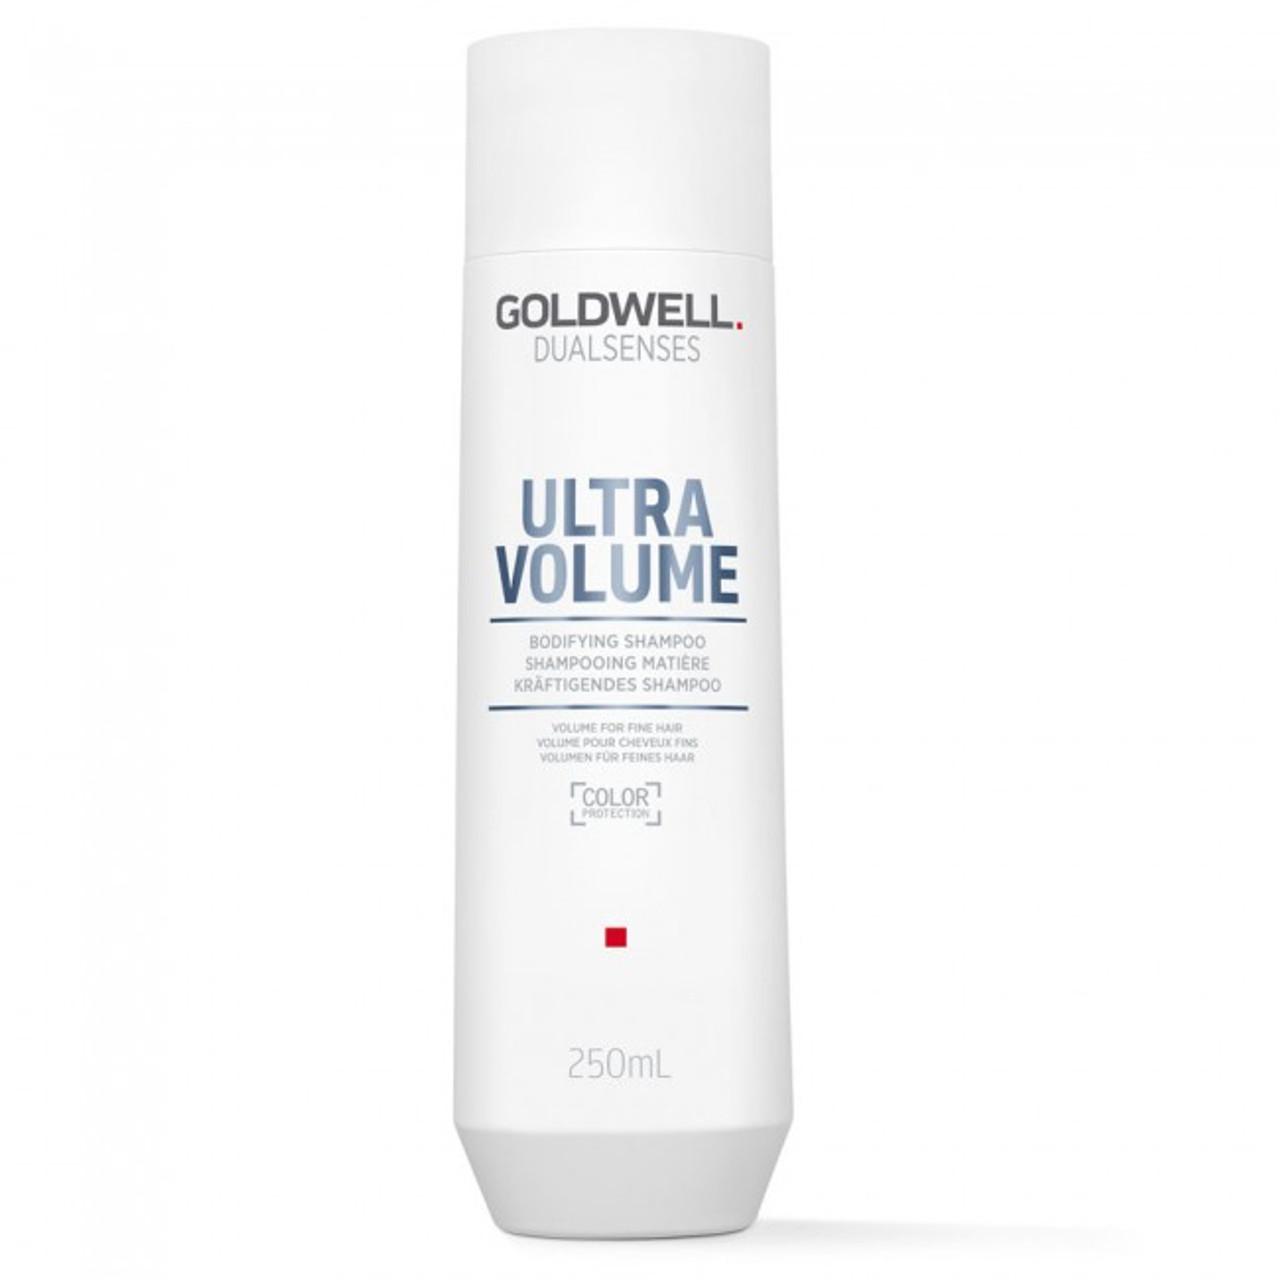 Goldwell Dualsenses Ultra Volume Shampoo 250 ml